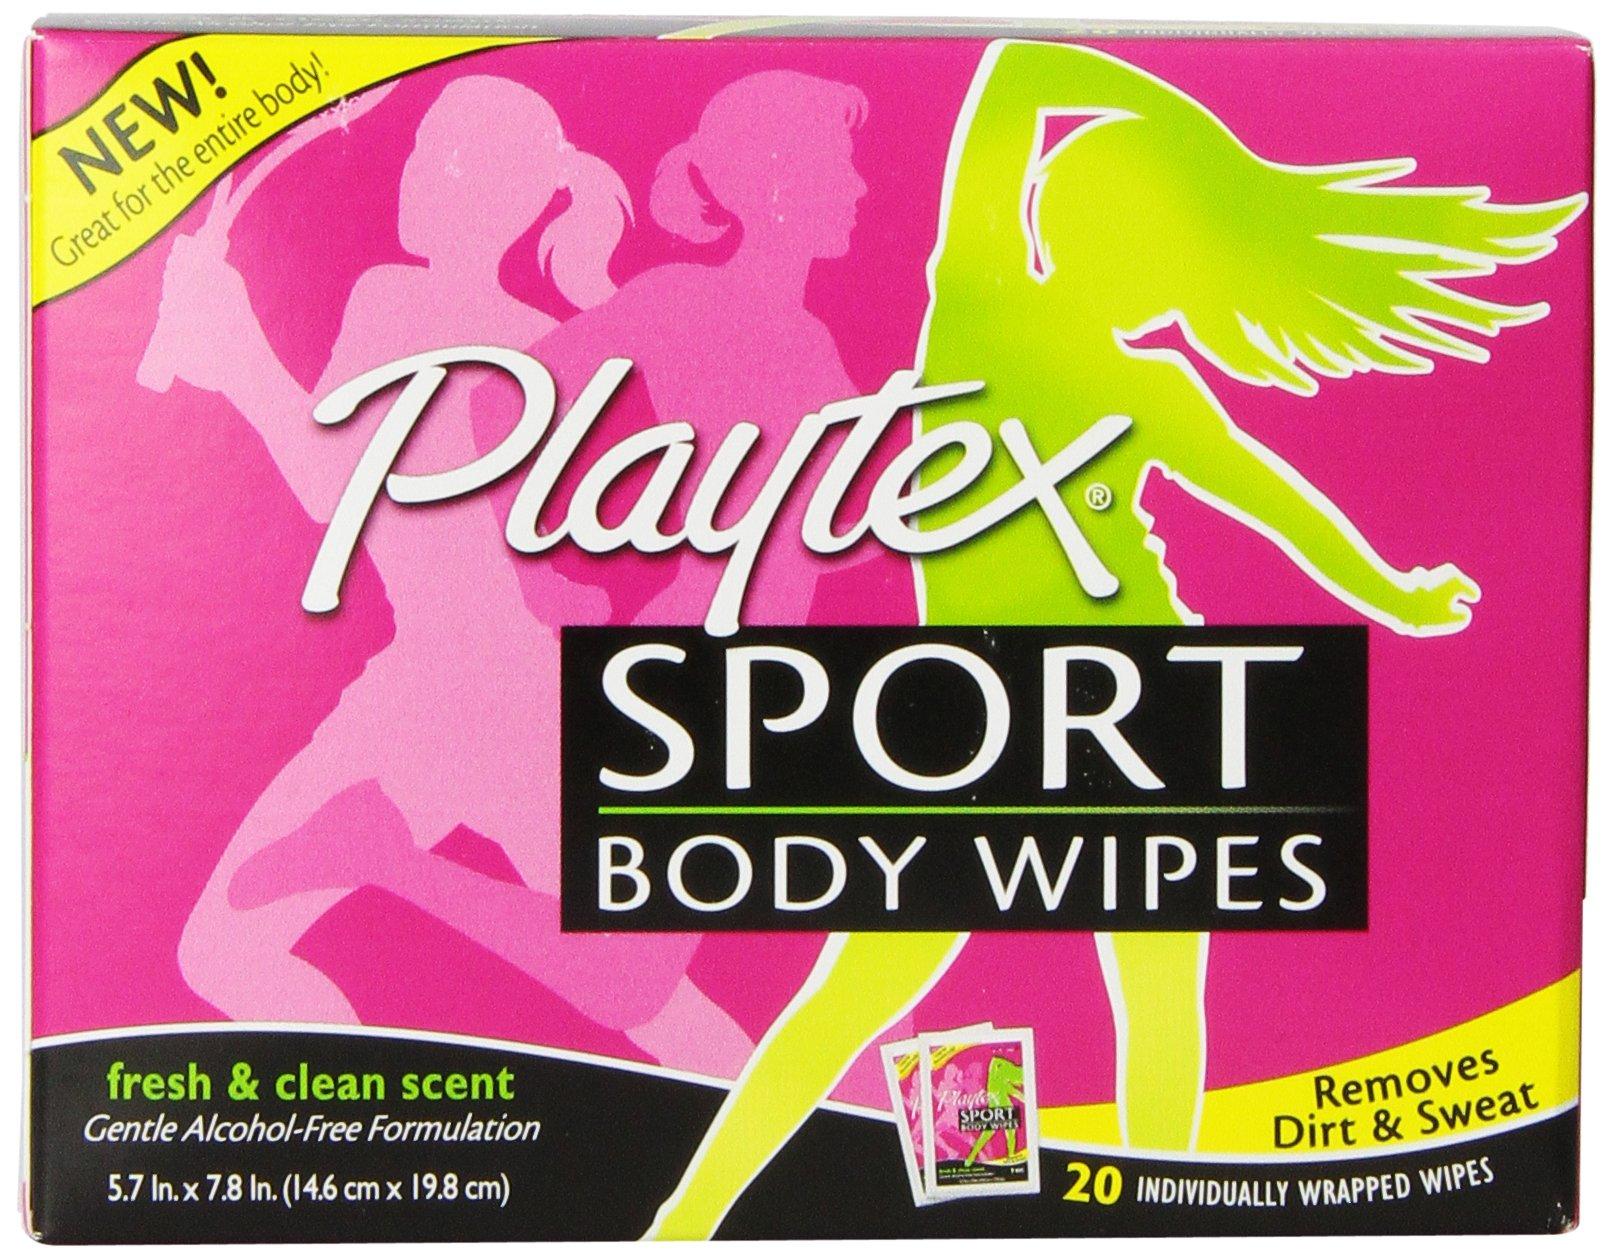 Playtex Sport Body Wipes Single Packs, 20-count (Pack of 5) by Playtex